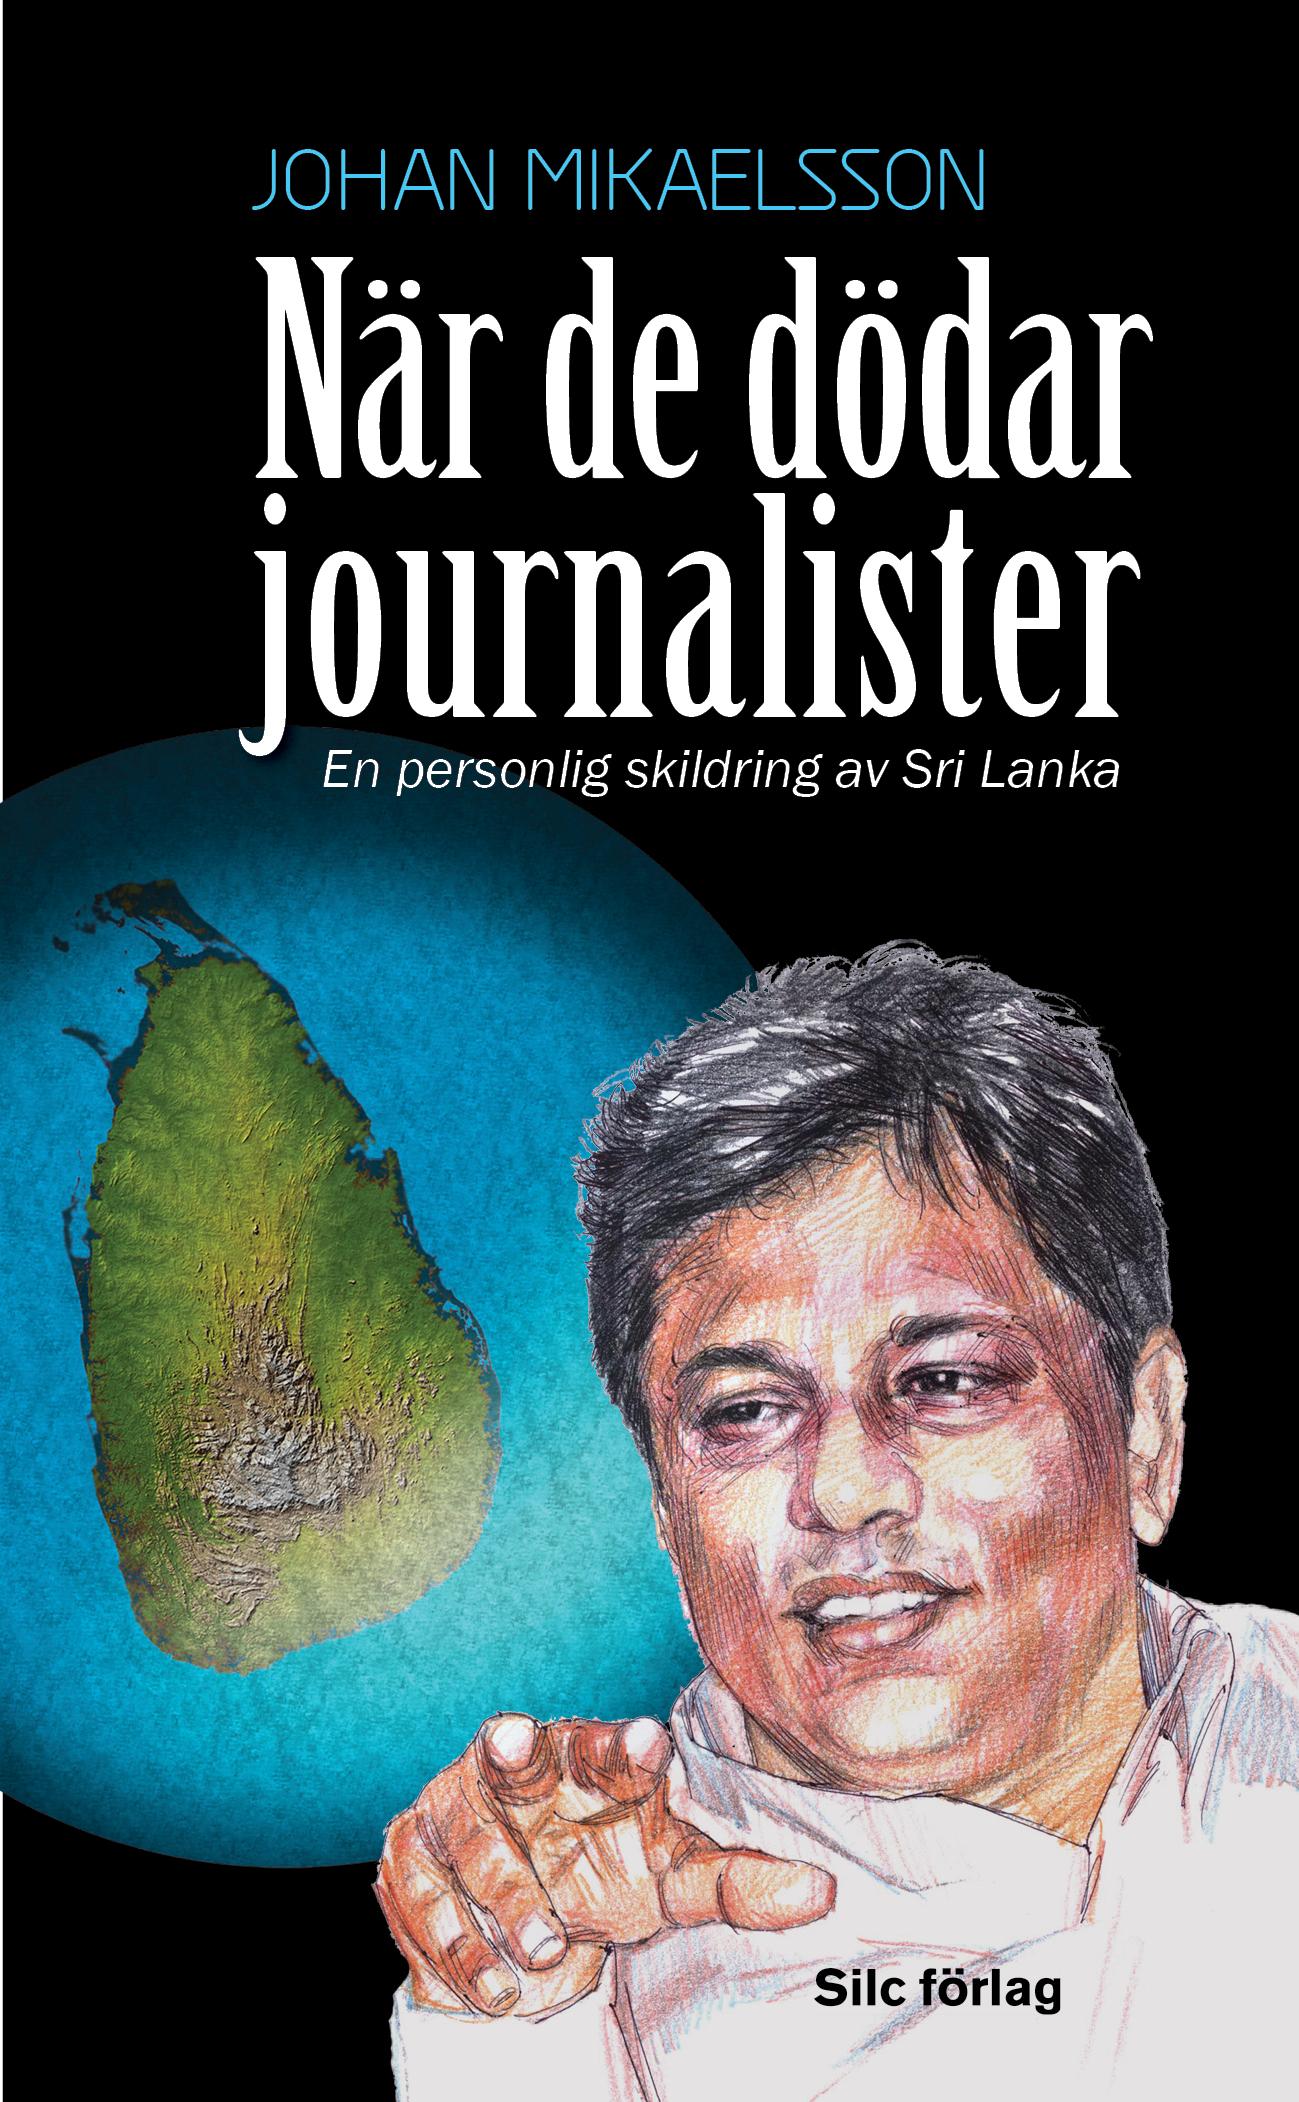 nar_de_dodar_journalister_hires_framsida